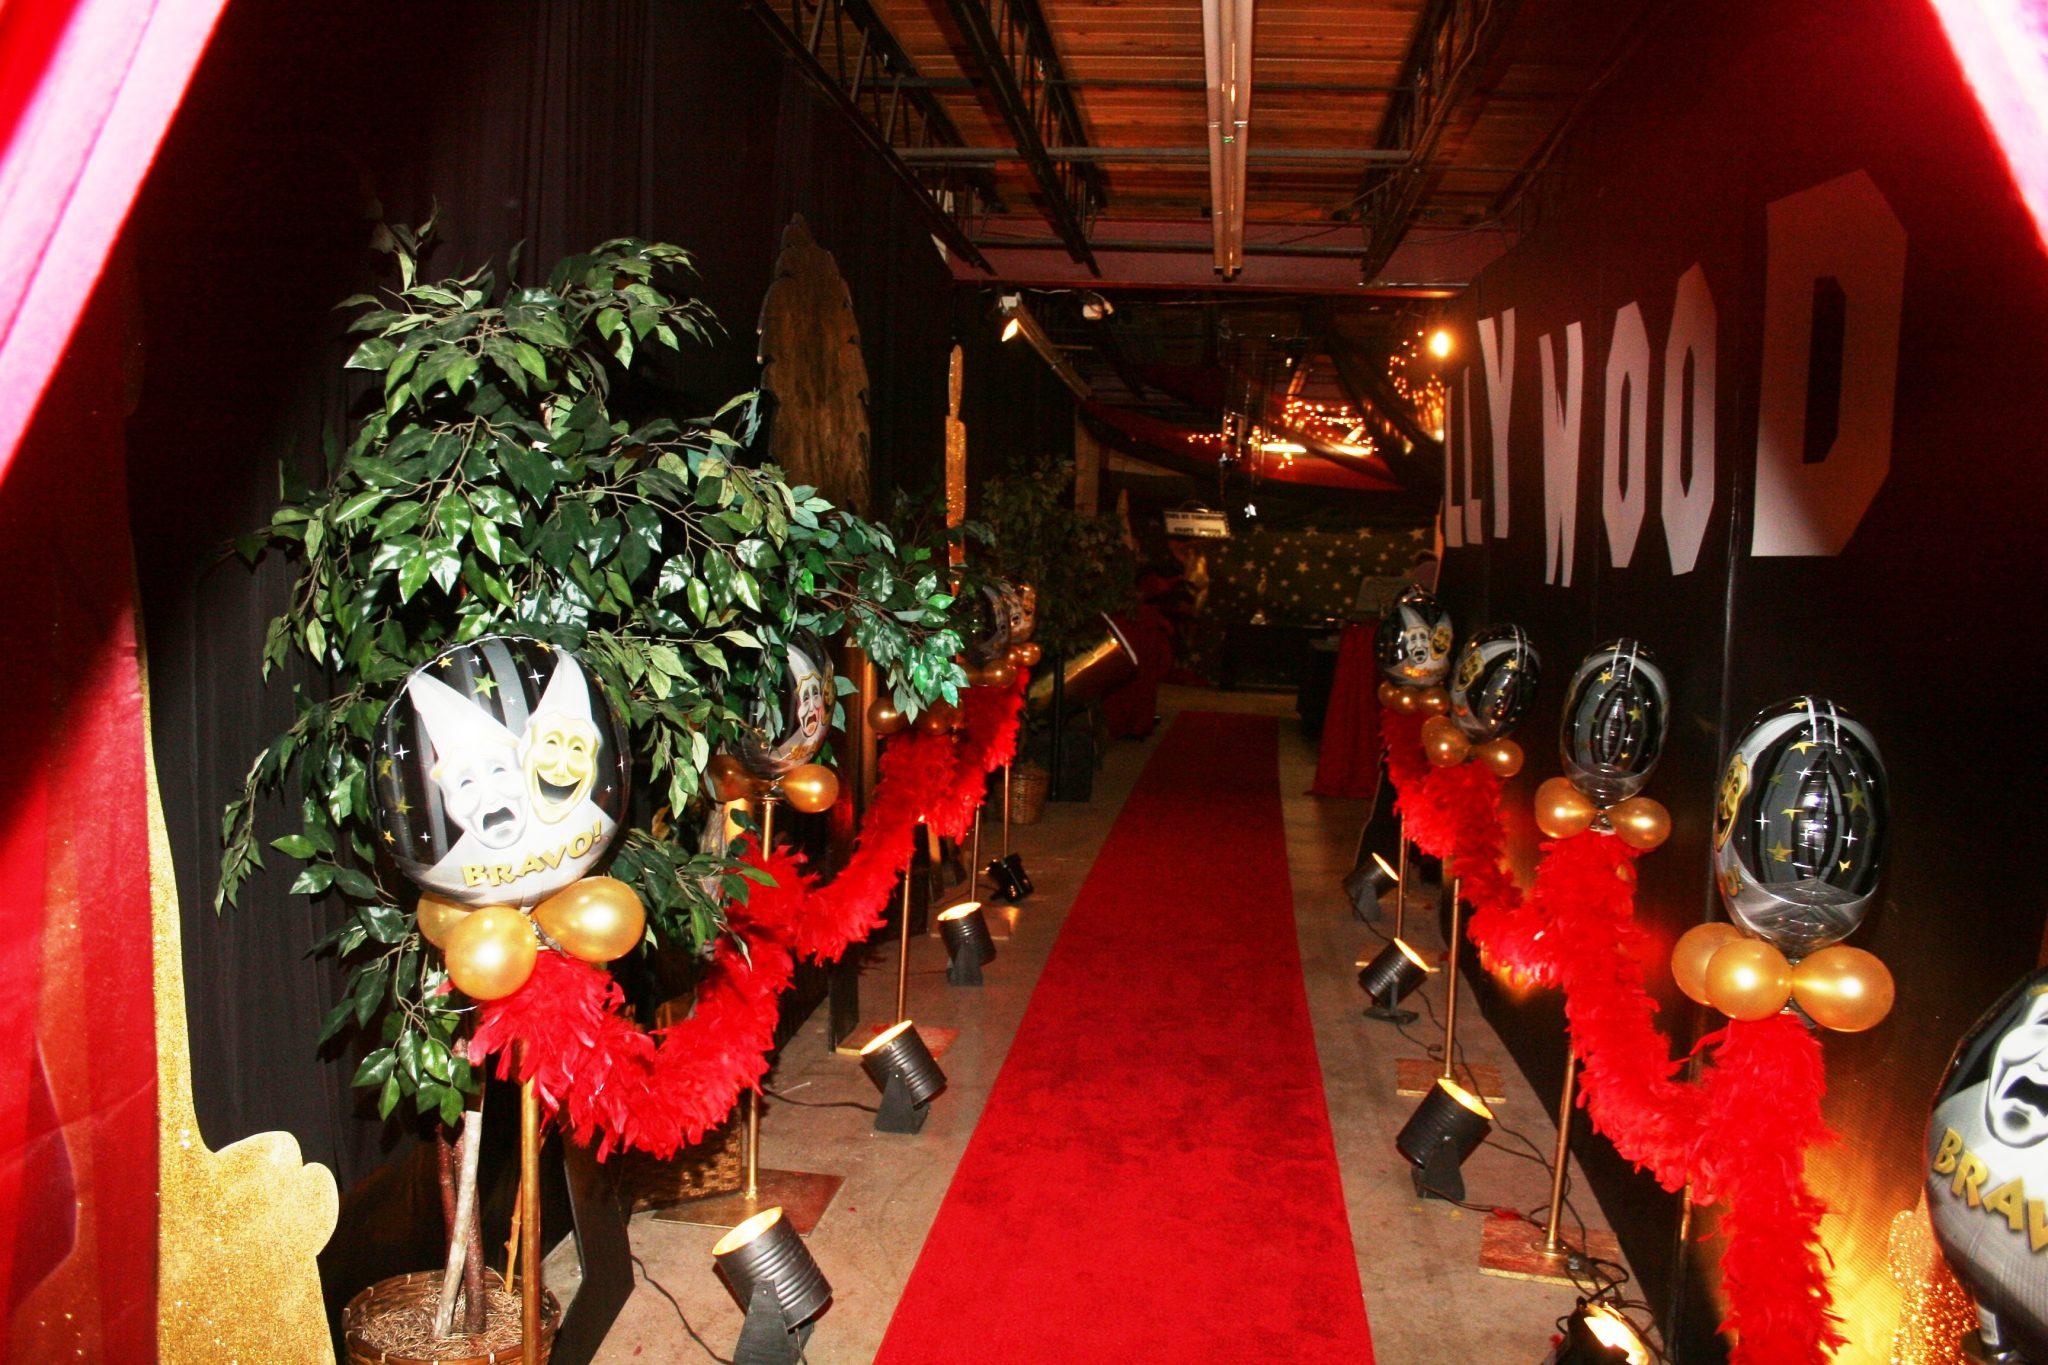 Oscars Red Carpet Backdrop